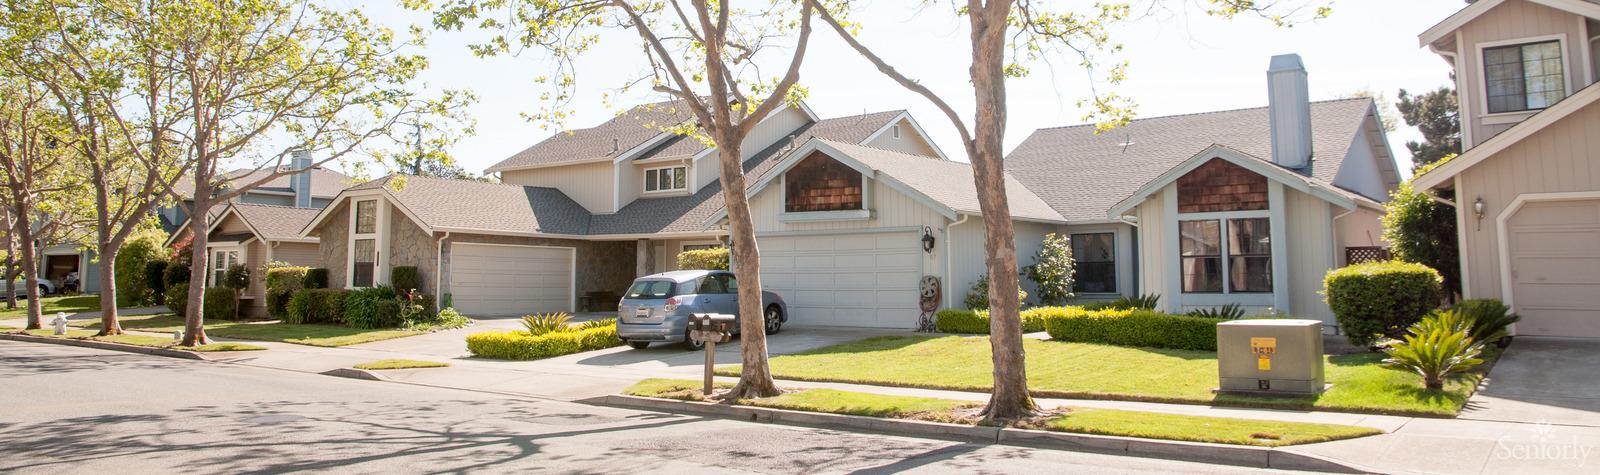 Golden Age Bayside Alameda CA 3